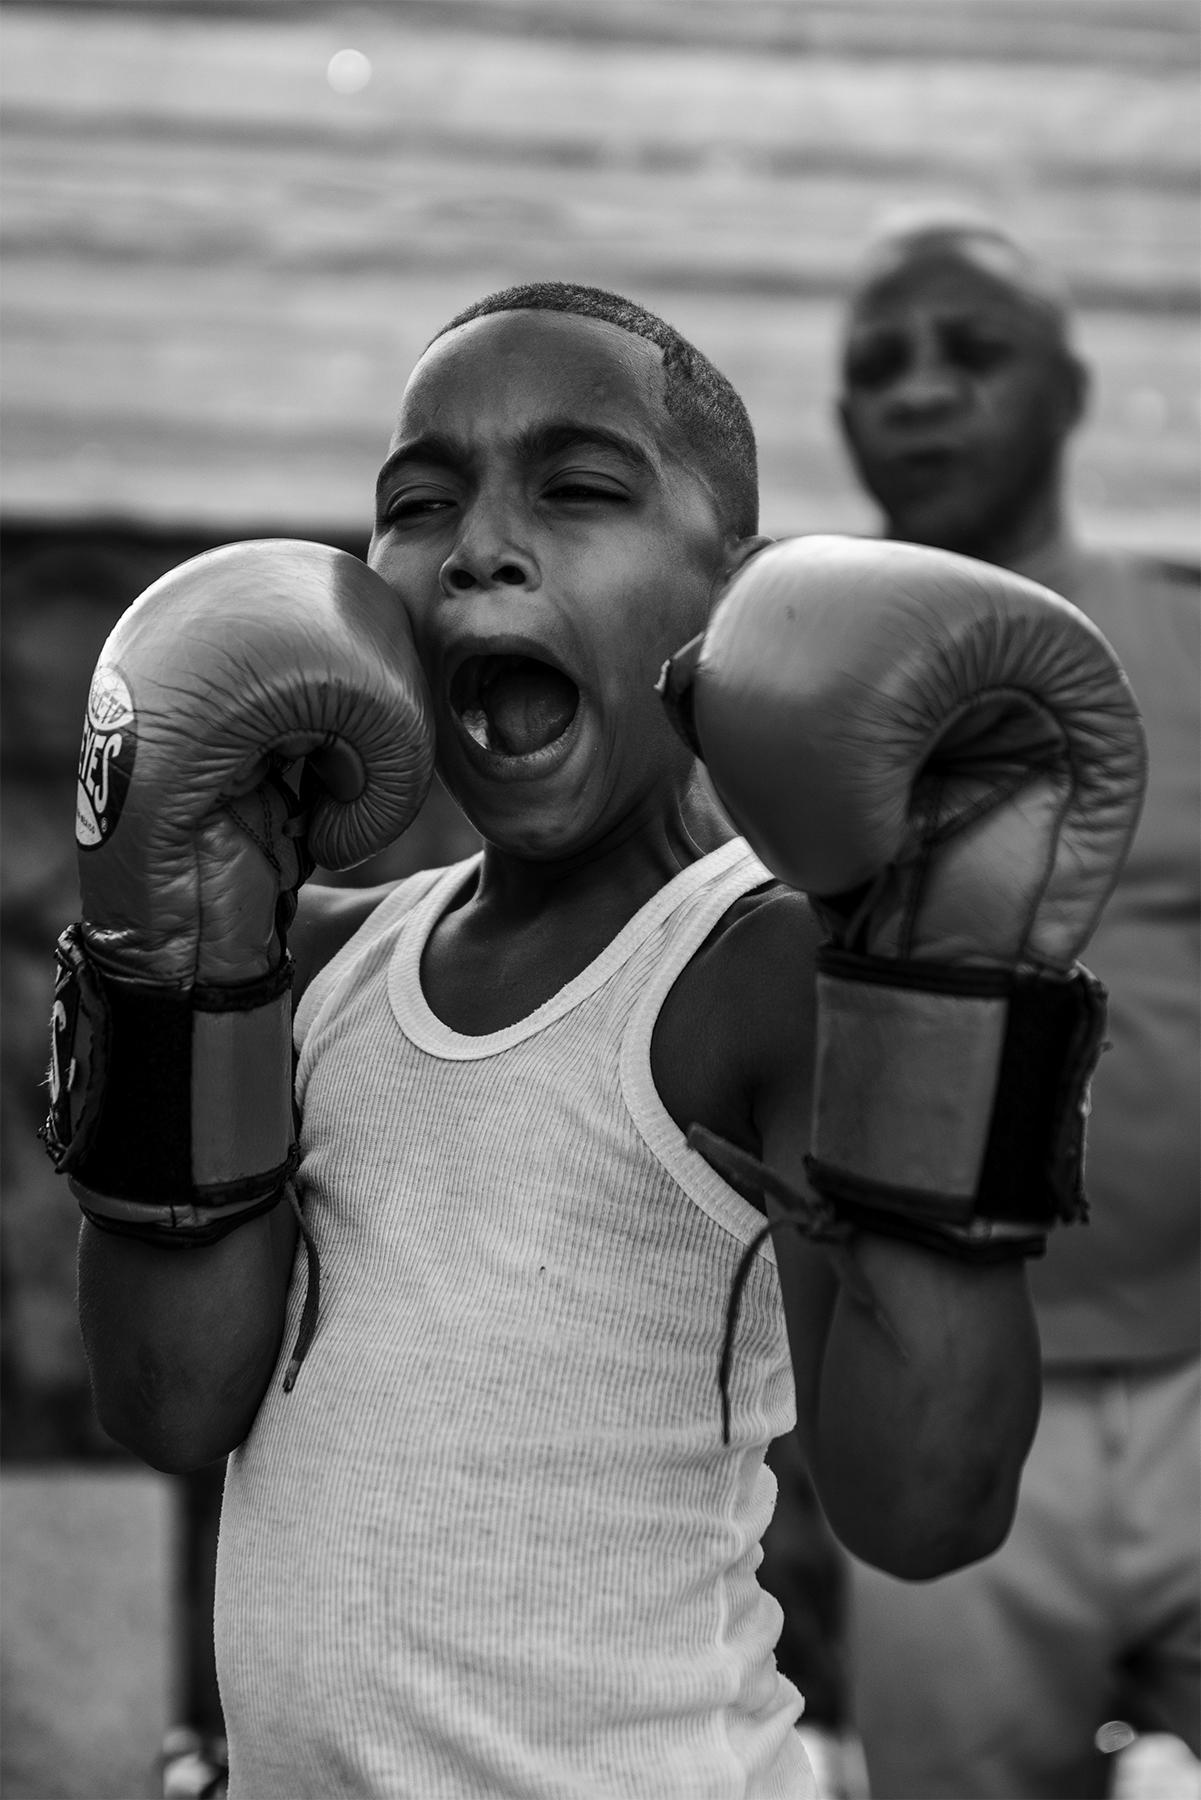 Boxing_Havana_2018_APR_LGP_6651_BW_4x6.jpg